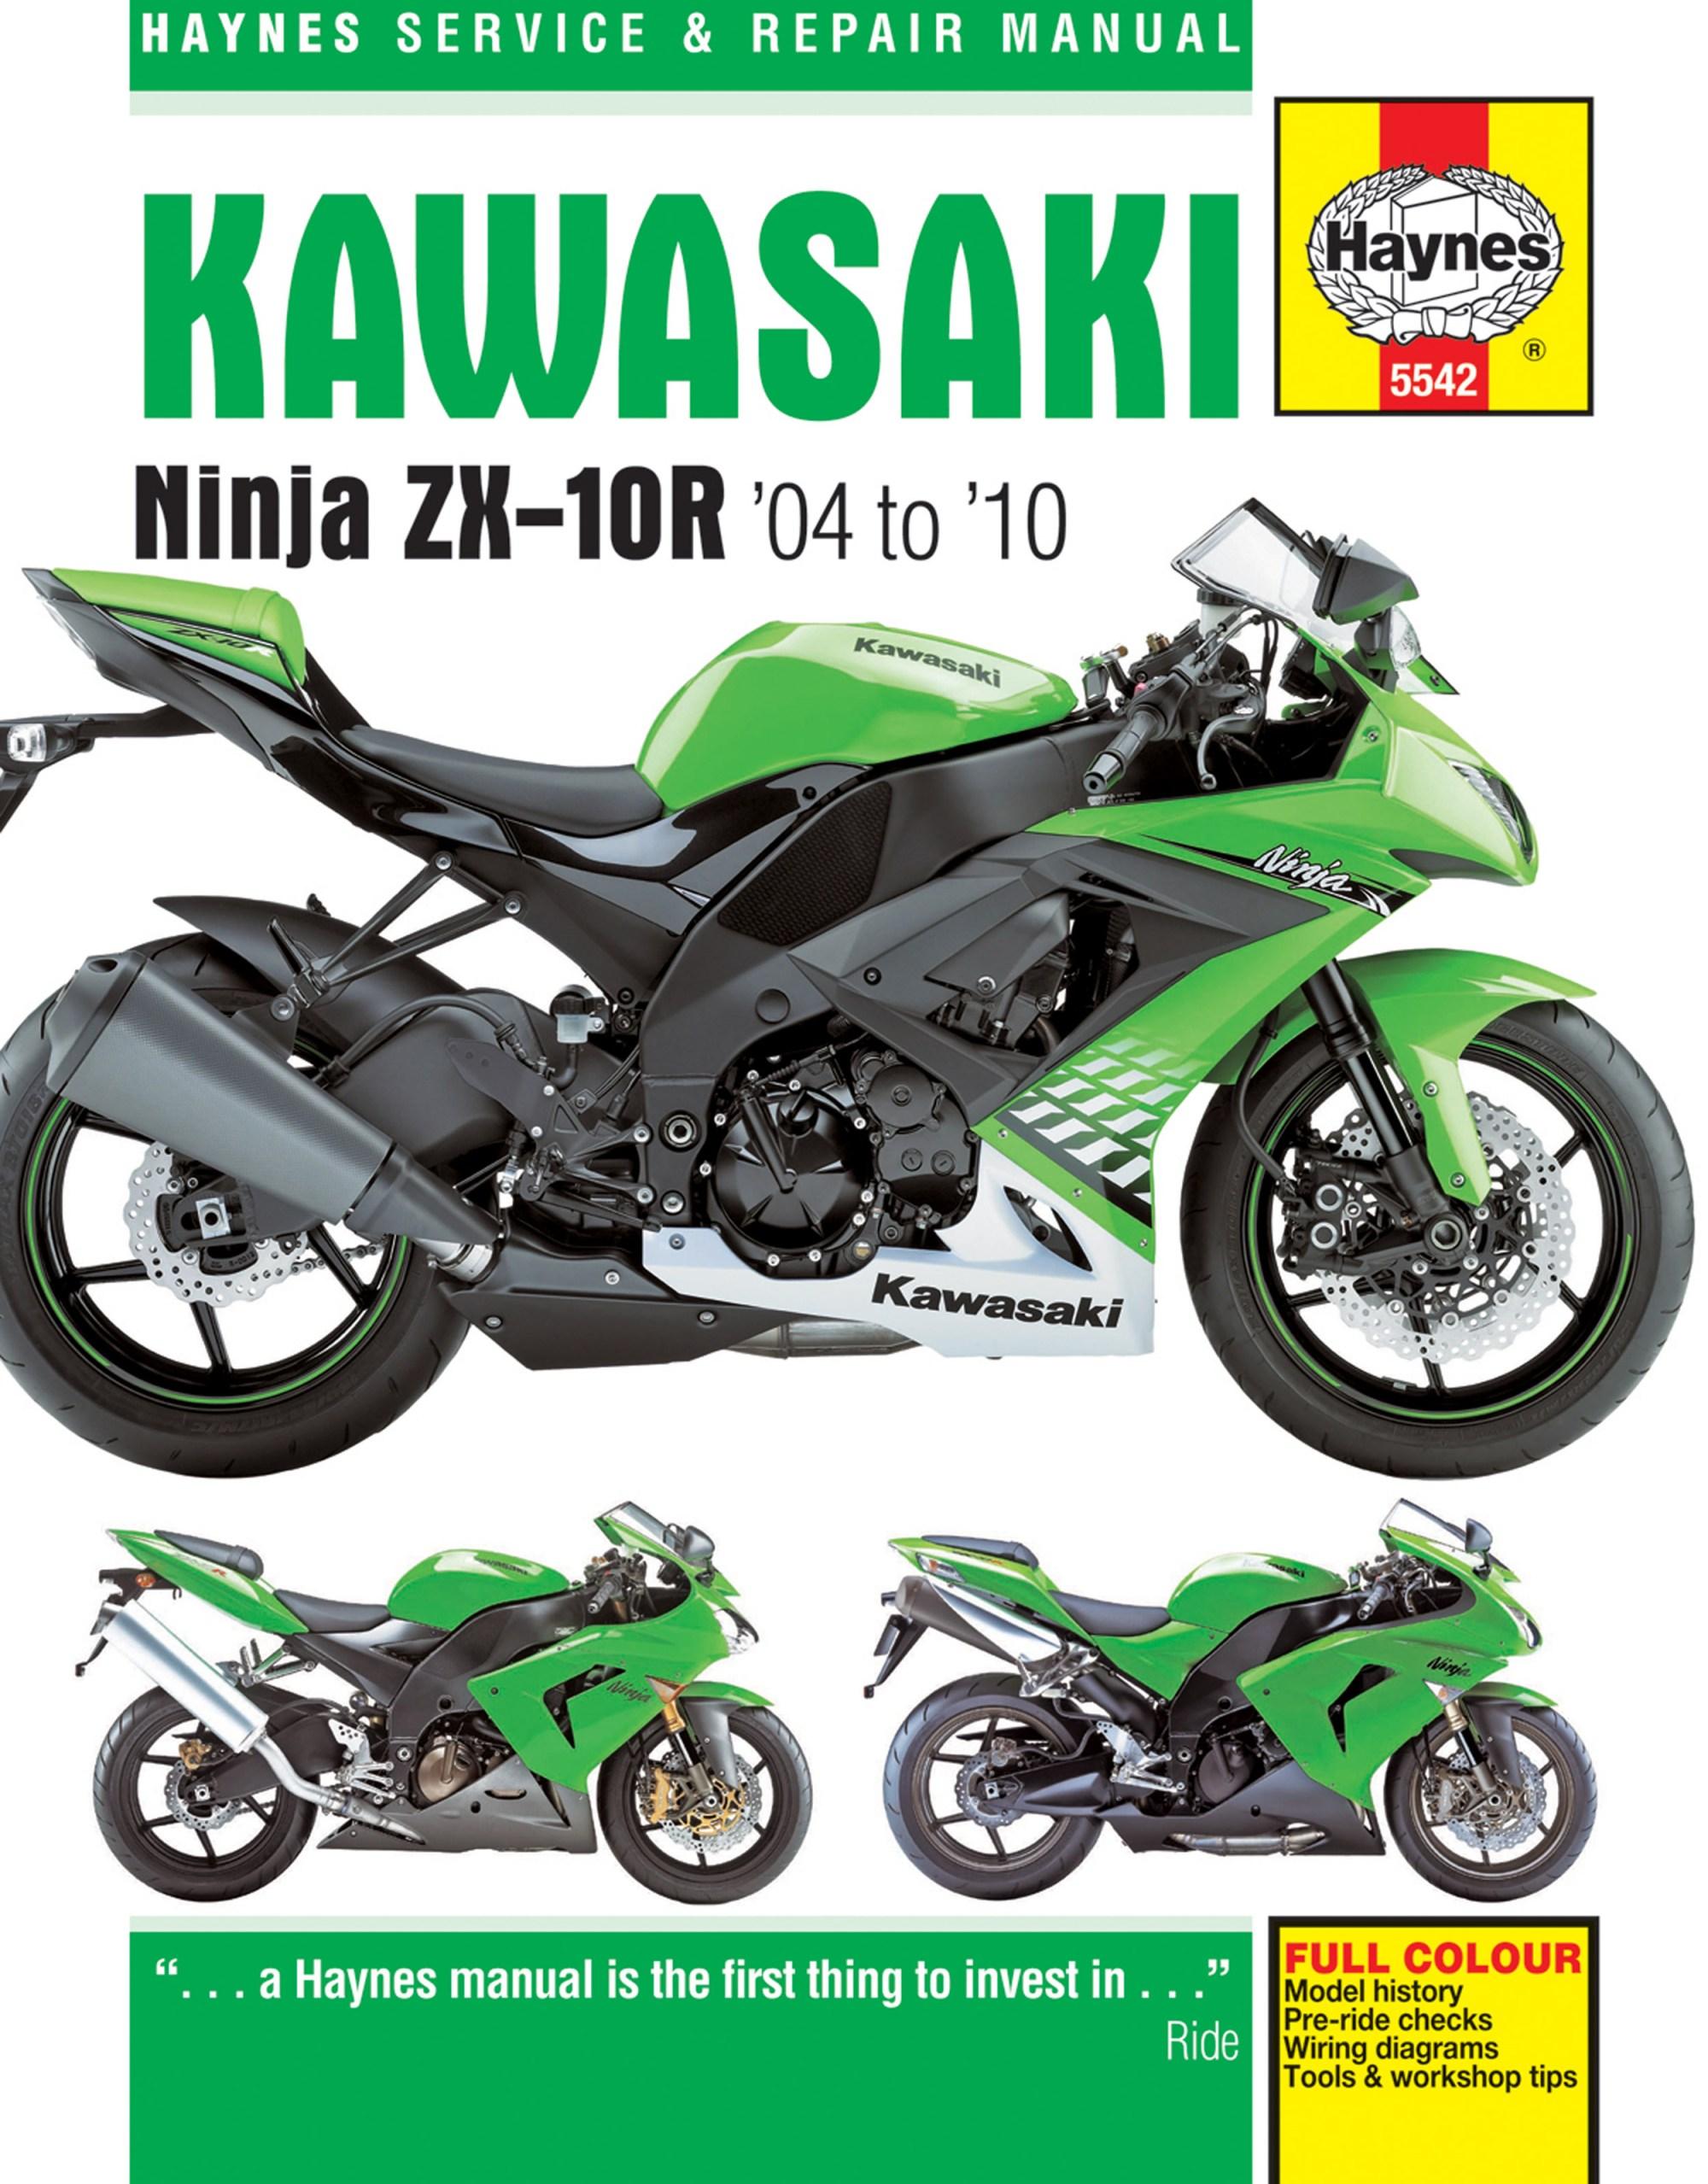 hight resolution of 2004 zx10r wiring diagram wiring librarykawasaki zx10r 2004 2010 motorcycle repair manuals haynes manuals